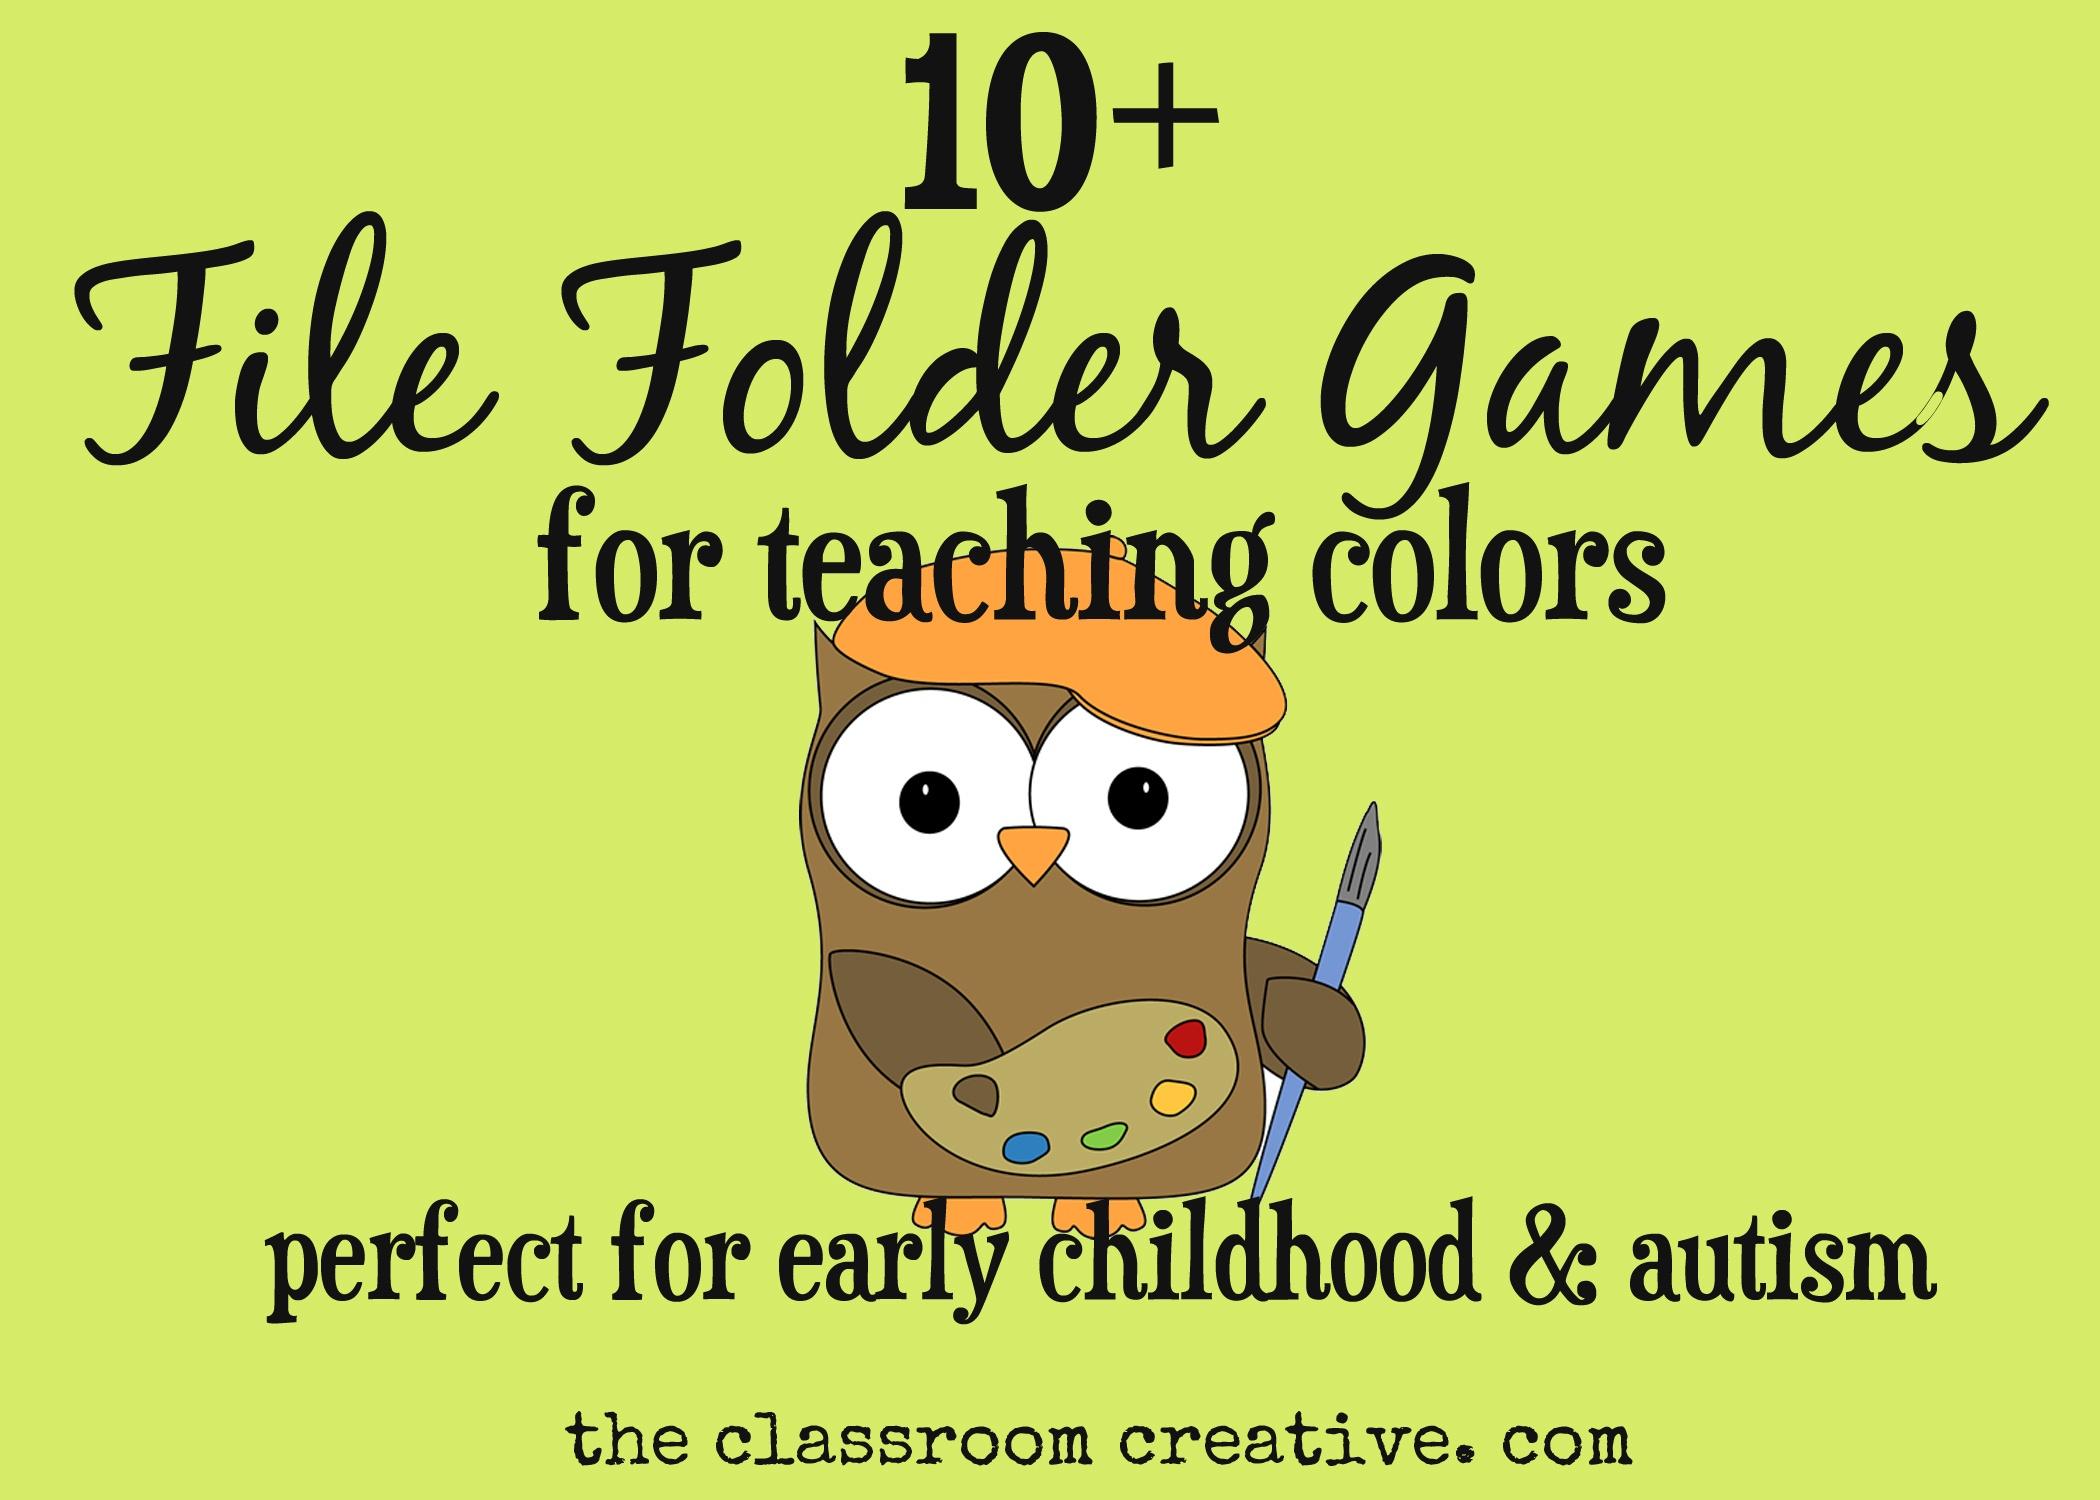 File Folder Games For Teaching Colors - Free Printable File Folder Games For Preschool